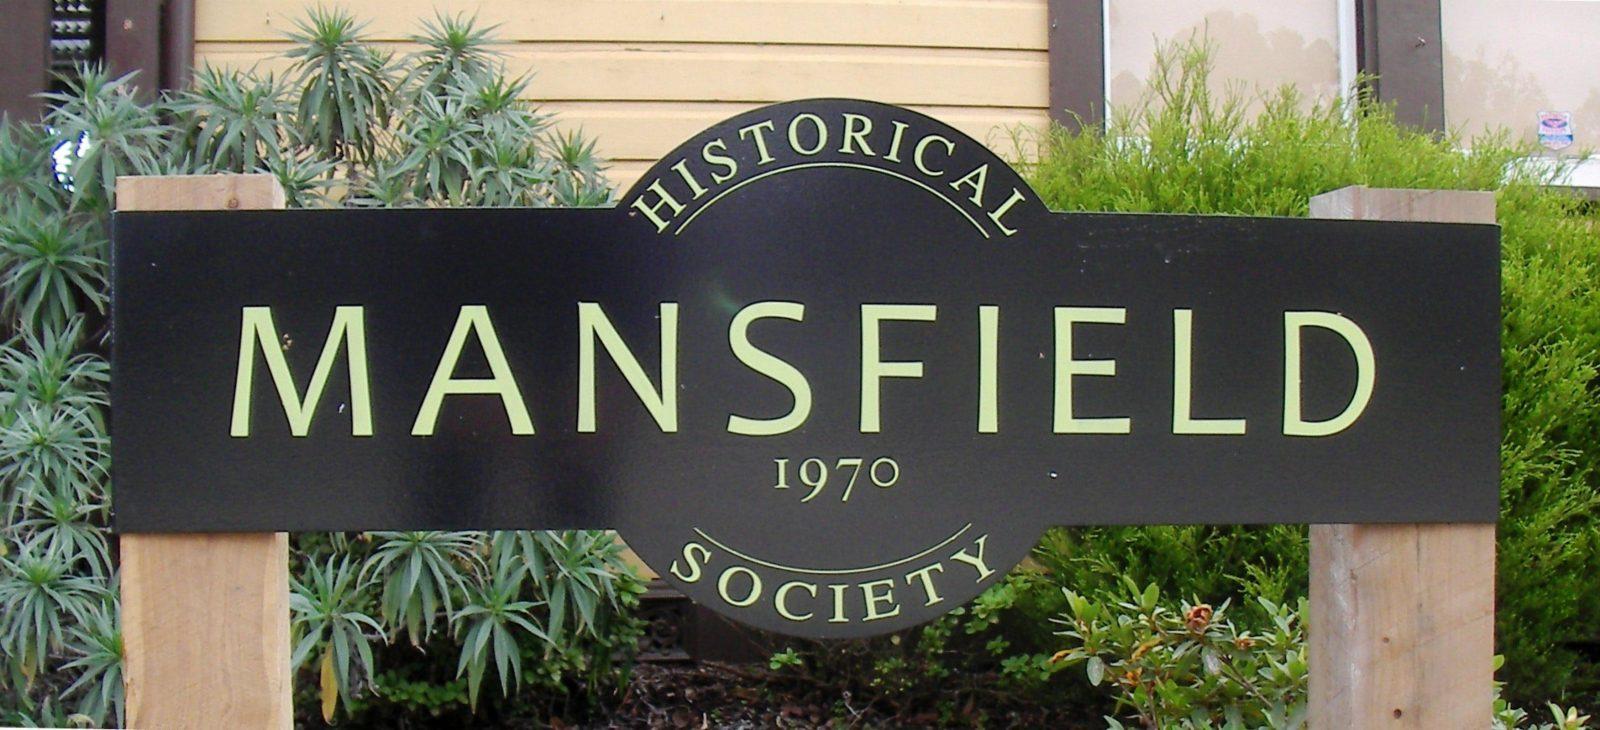 Mansfield Historical Society